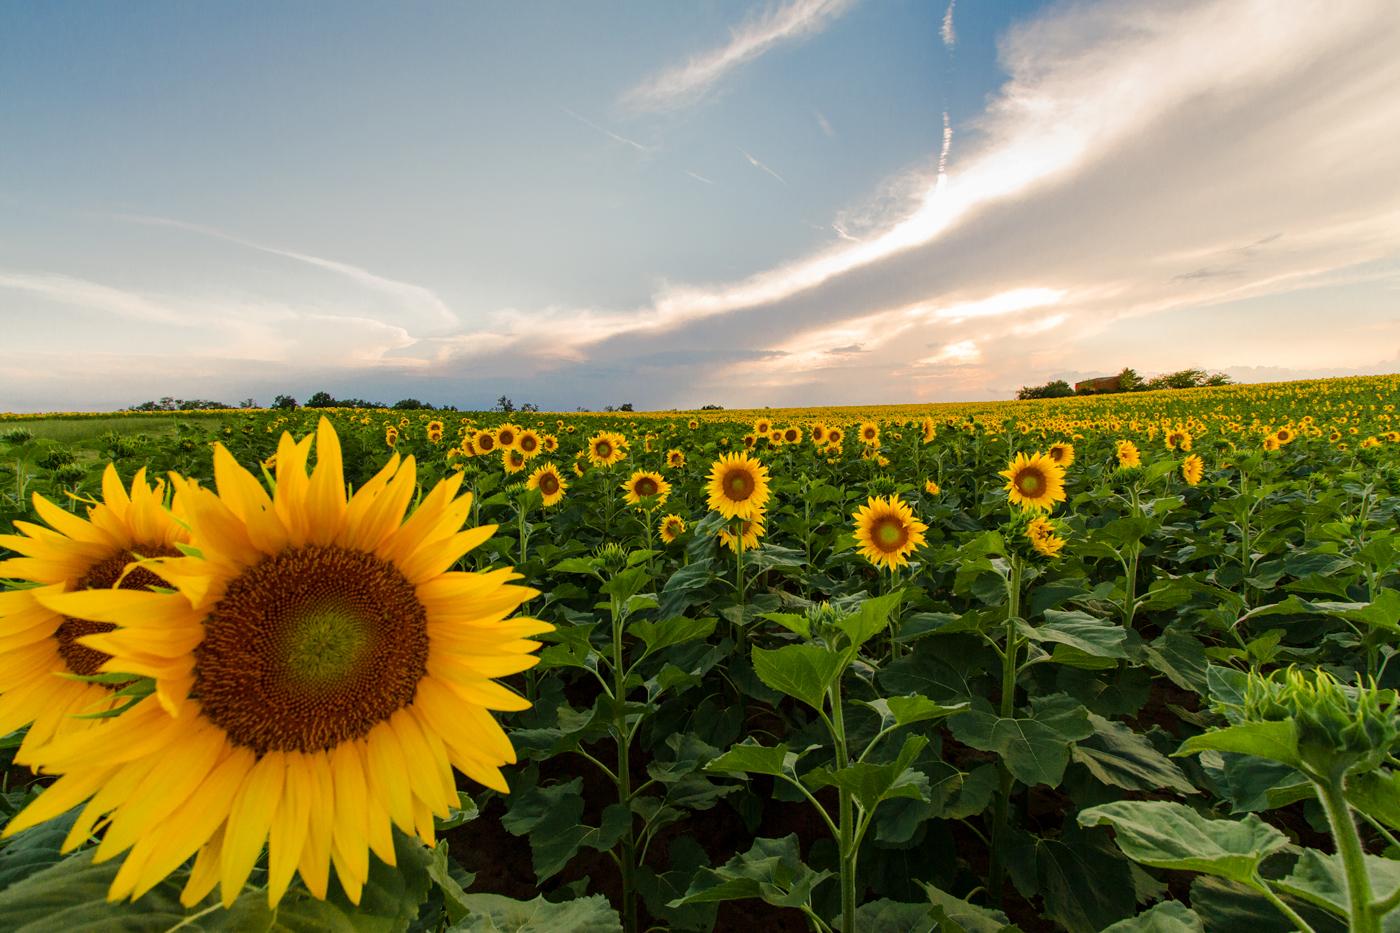 Sunflowers at Sunset...